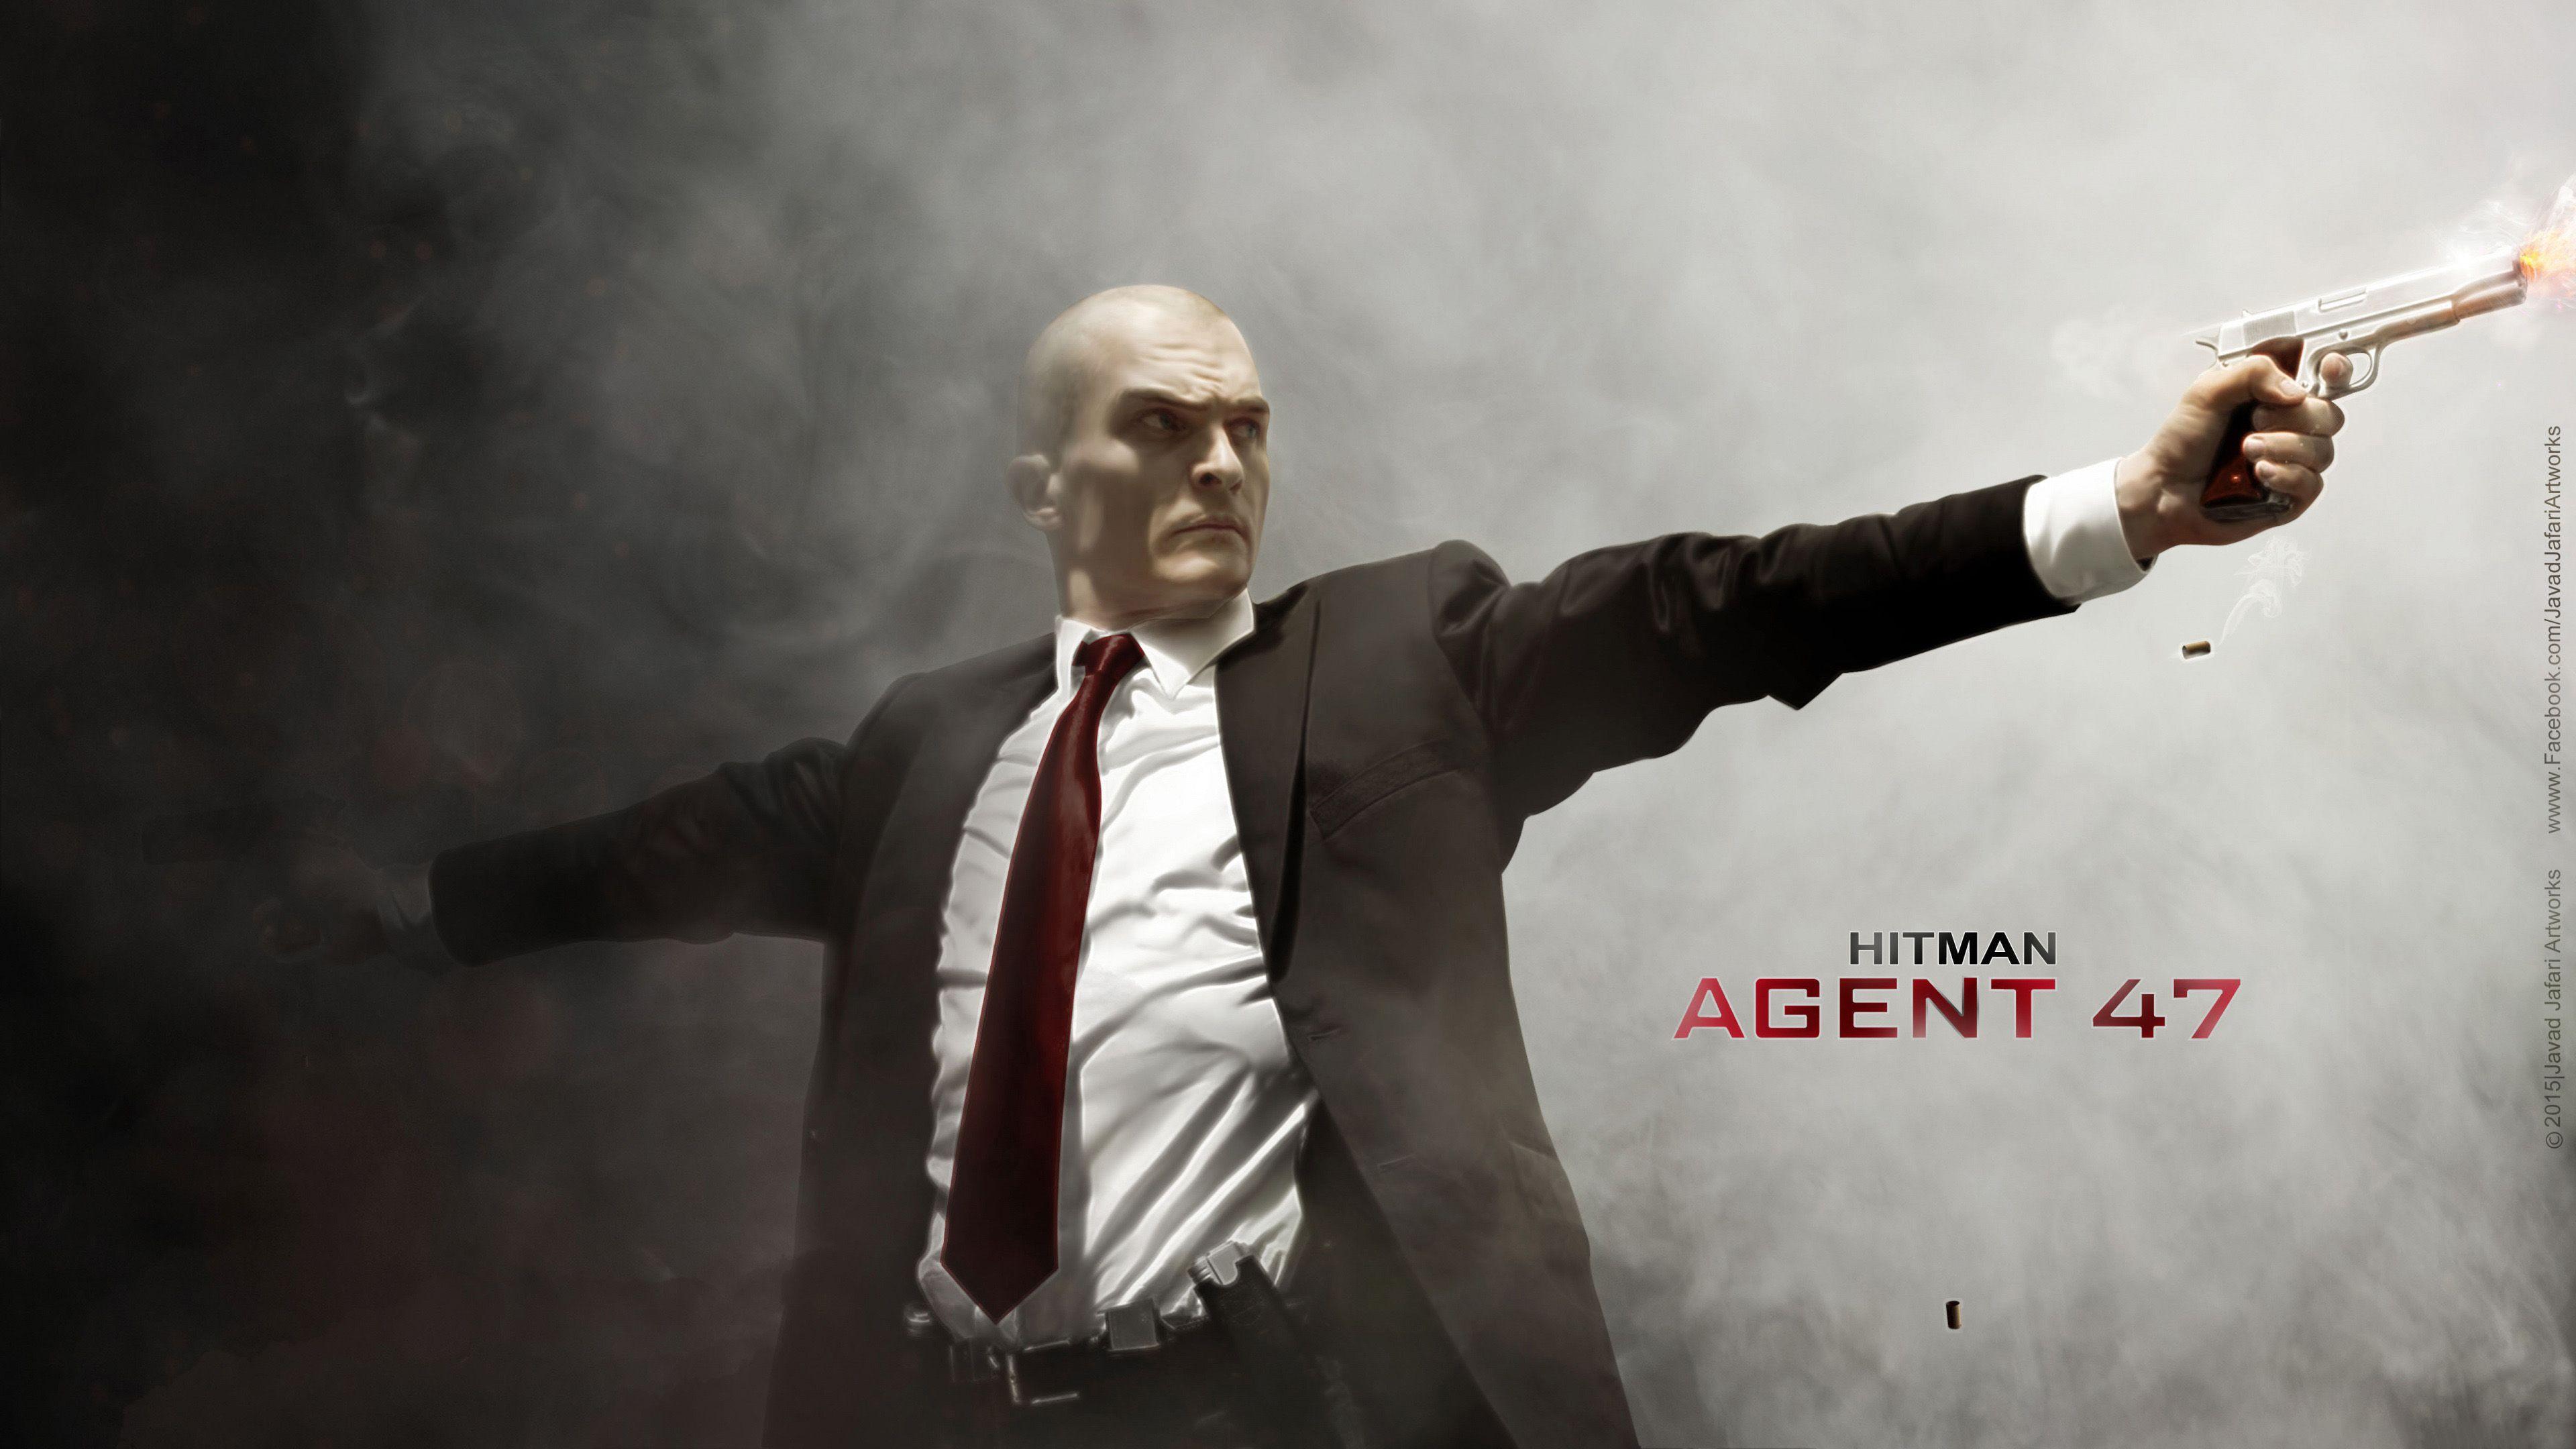 Hitman Agent 47 Second Trailer Reveal Hitman Agent 47 Hitman